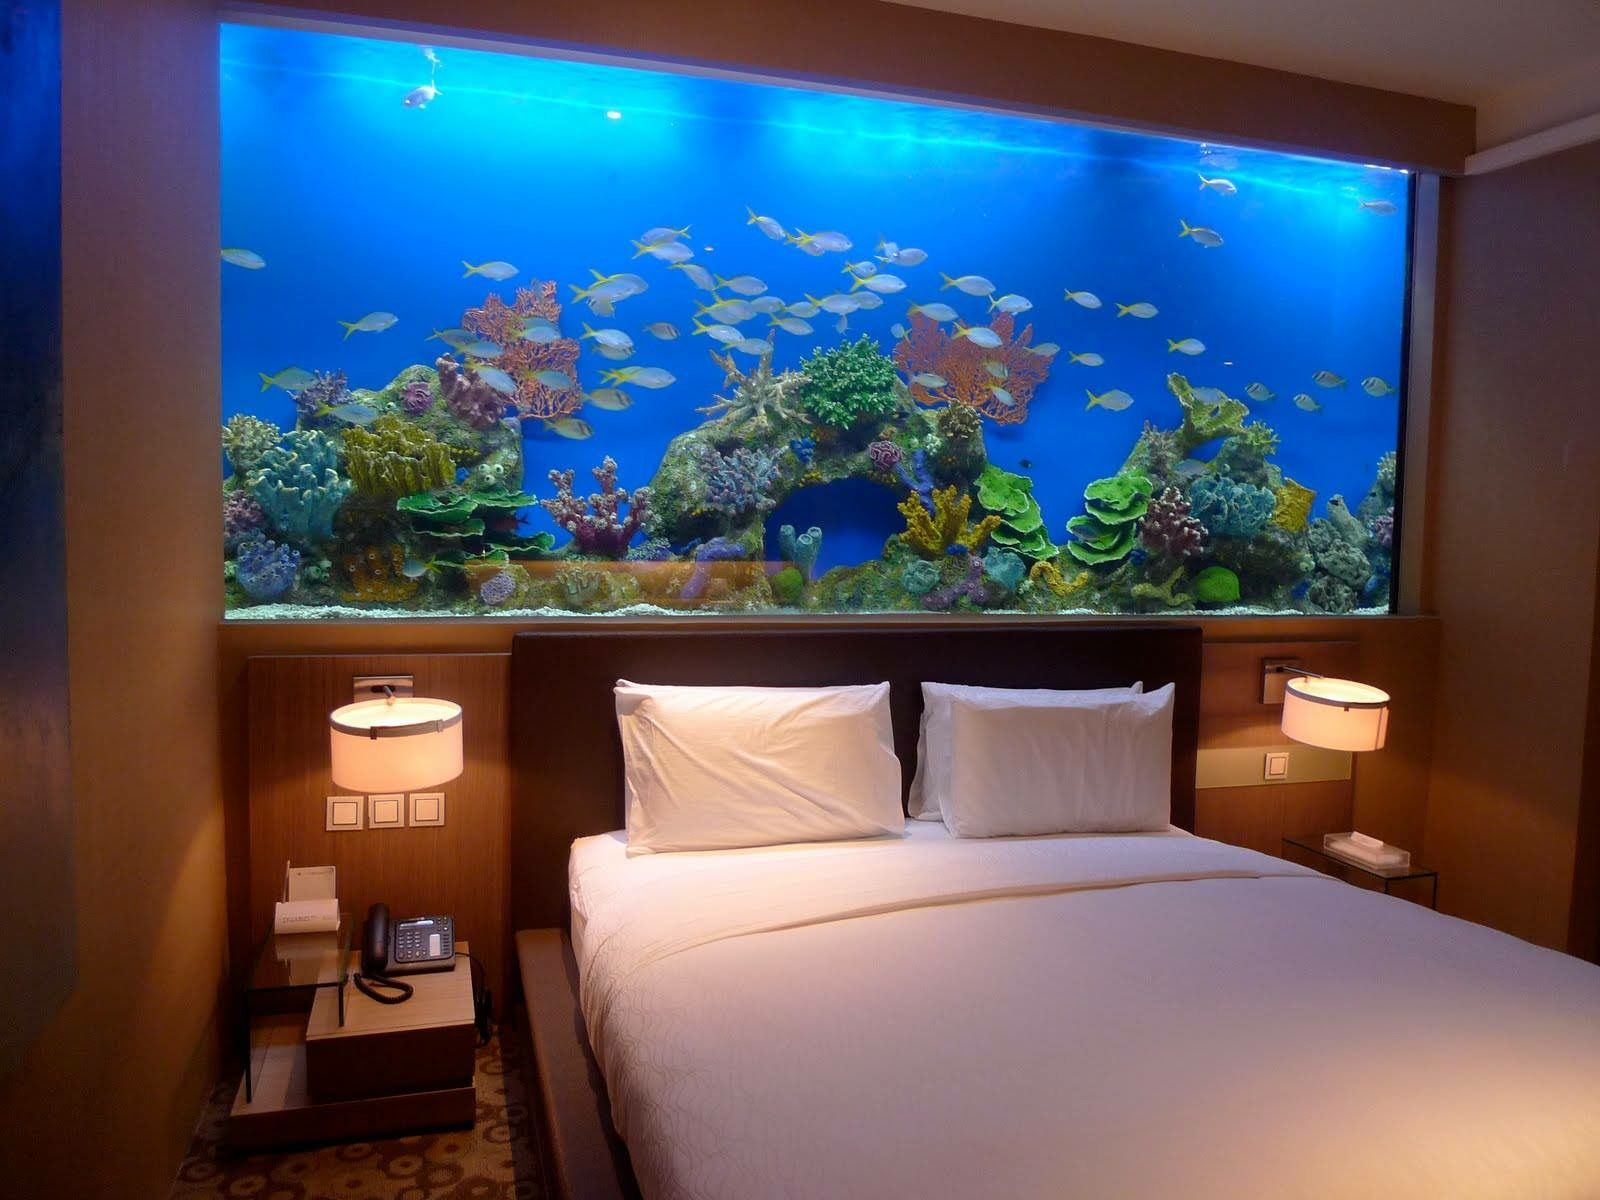 Home Aquarium Ideas The Aquarium Buyers Guide Ideal of an